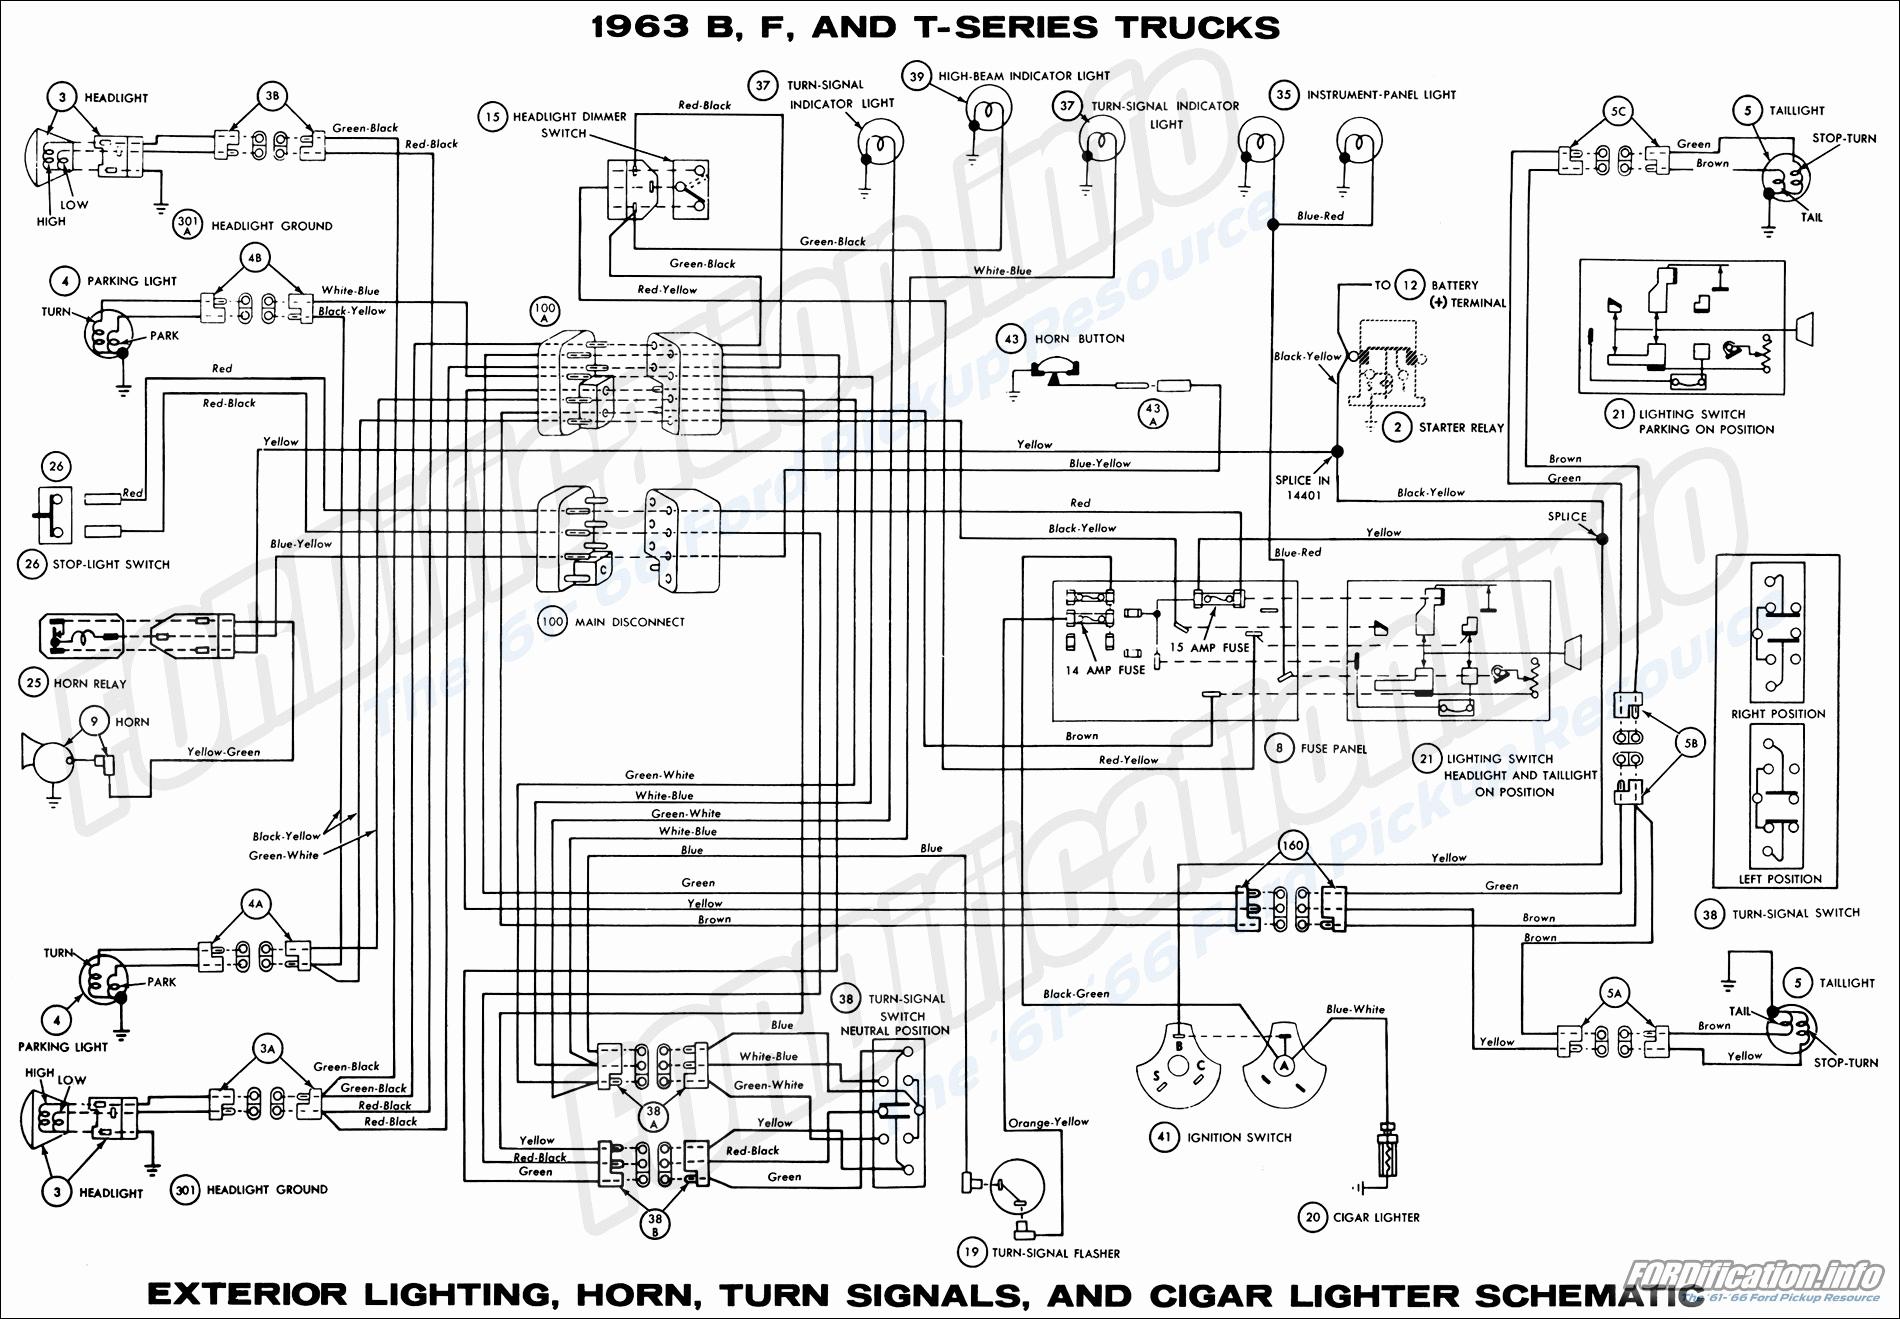 Speed Tech Lights Wiring Diagram | Wiring Diagram - Speed Tech Lights Wiring Diagram